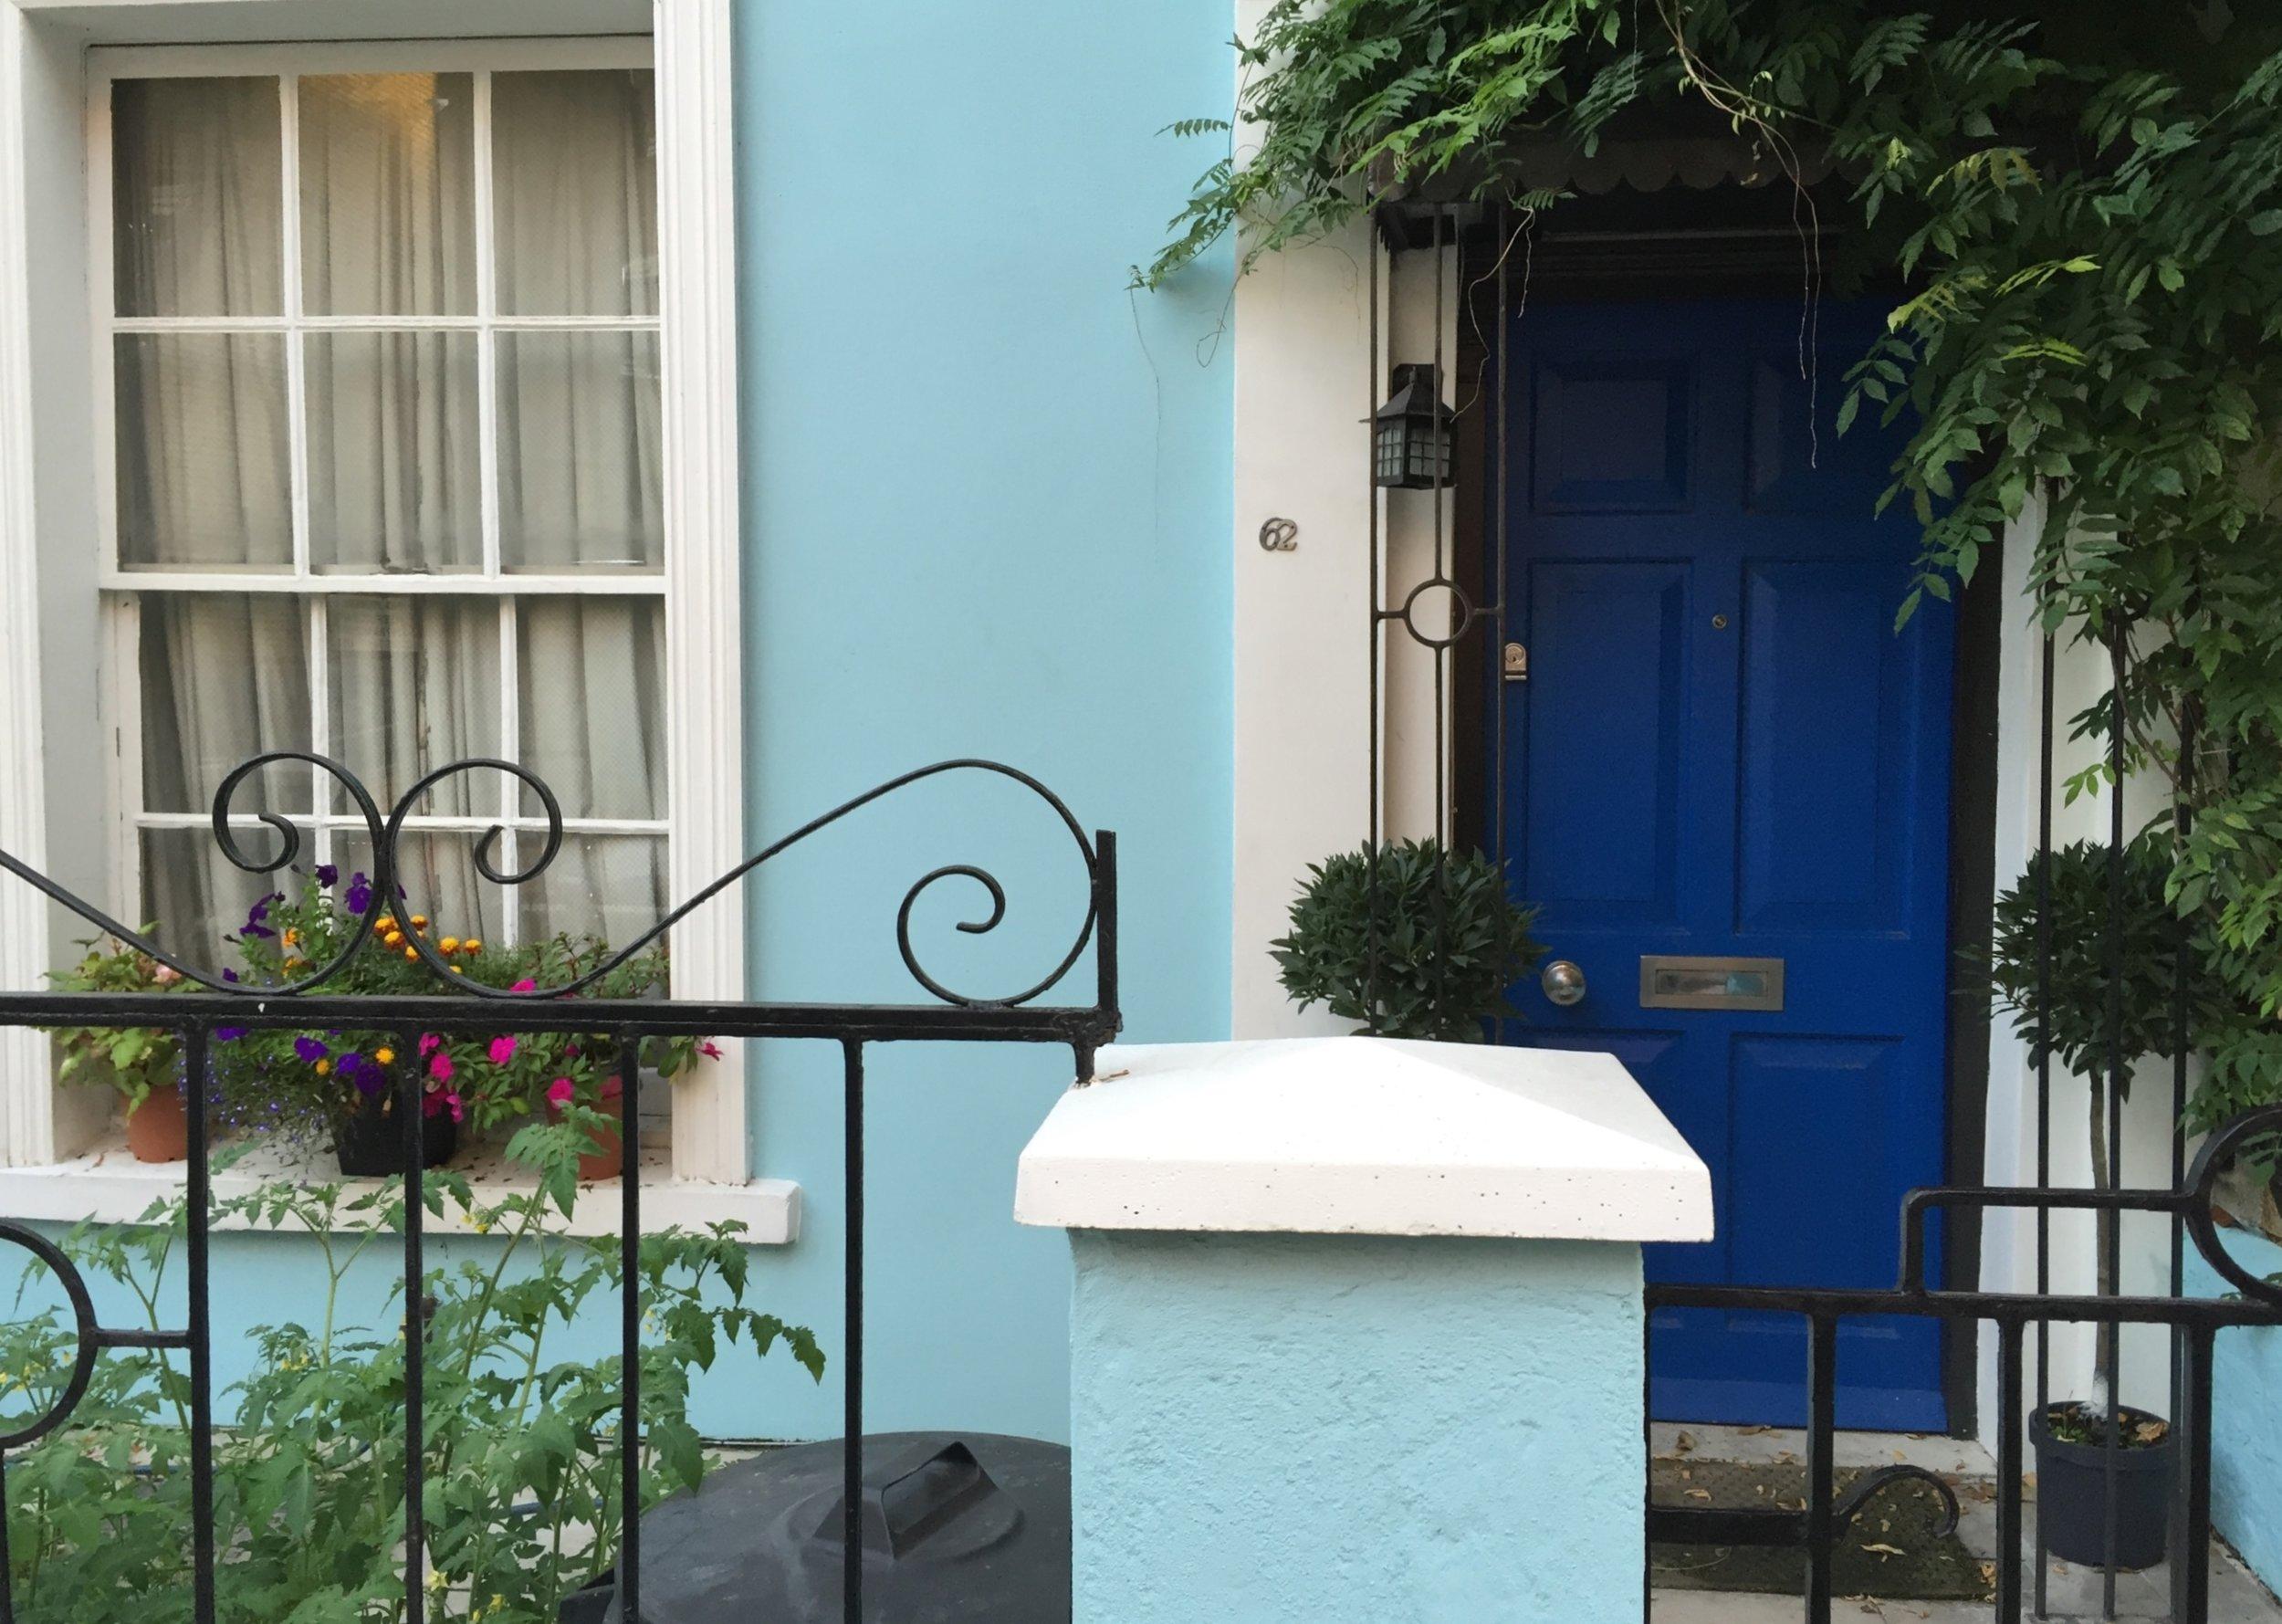 london-doors-nottinghill-blue-door-pale-blue-house